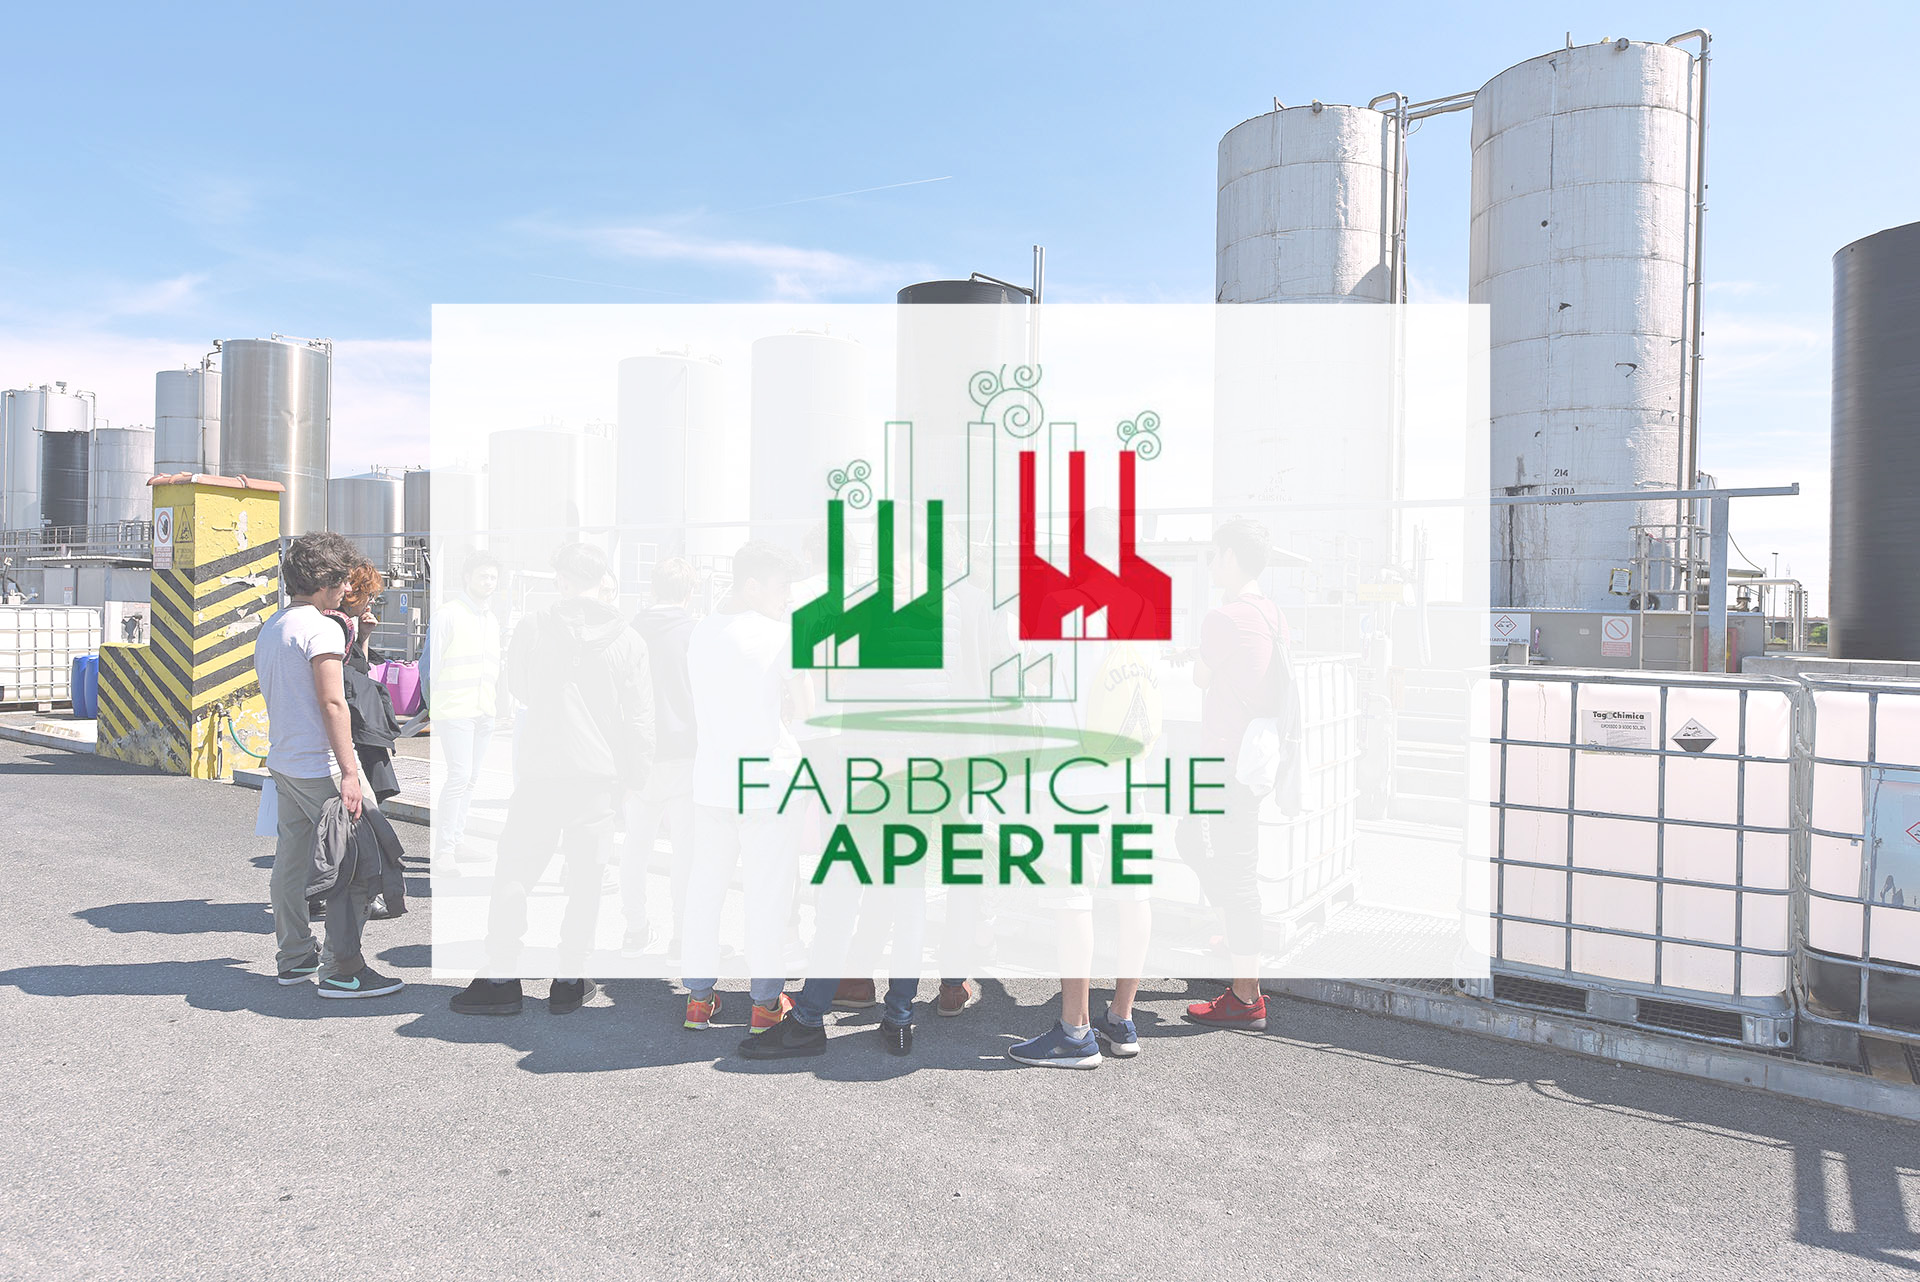 Fabbriche aperte gruppo Lapi 2016